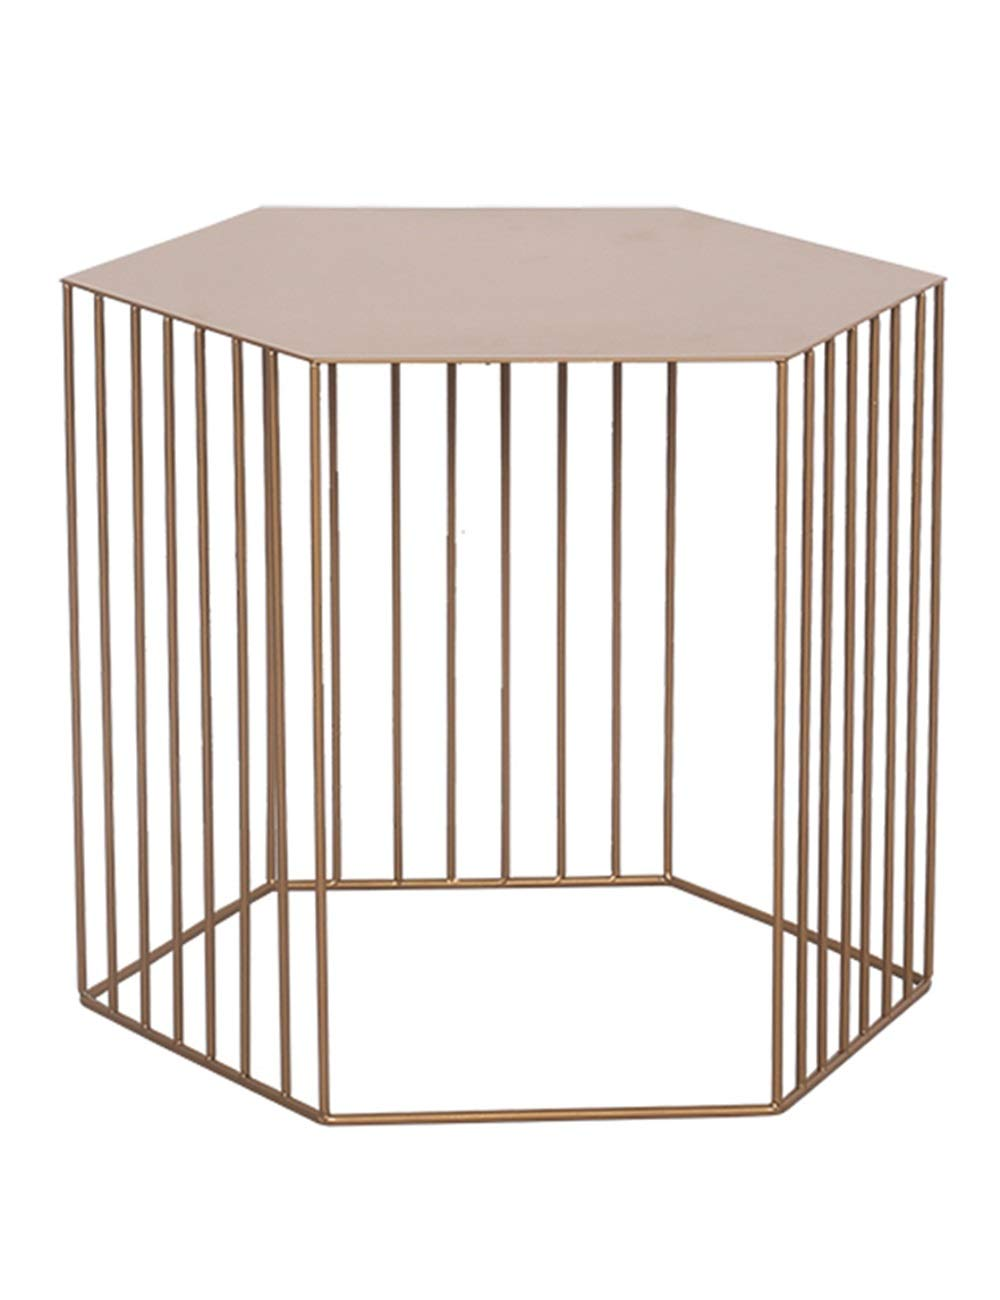 gold Iron Coffee Table Creative Table Geometric Corner, Simple Modern Sofa Side Shelves, Creative Small Apartment Living Room, gold, Black (45×45×38cm)